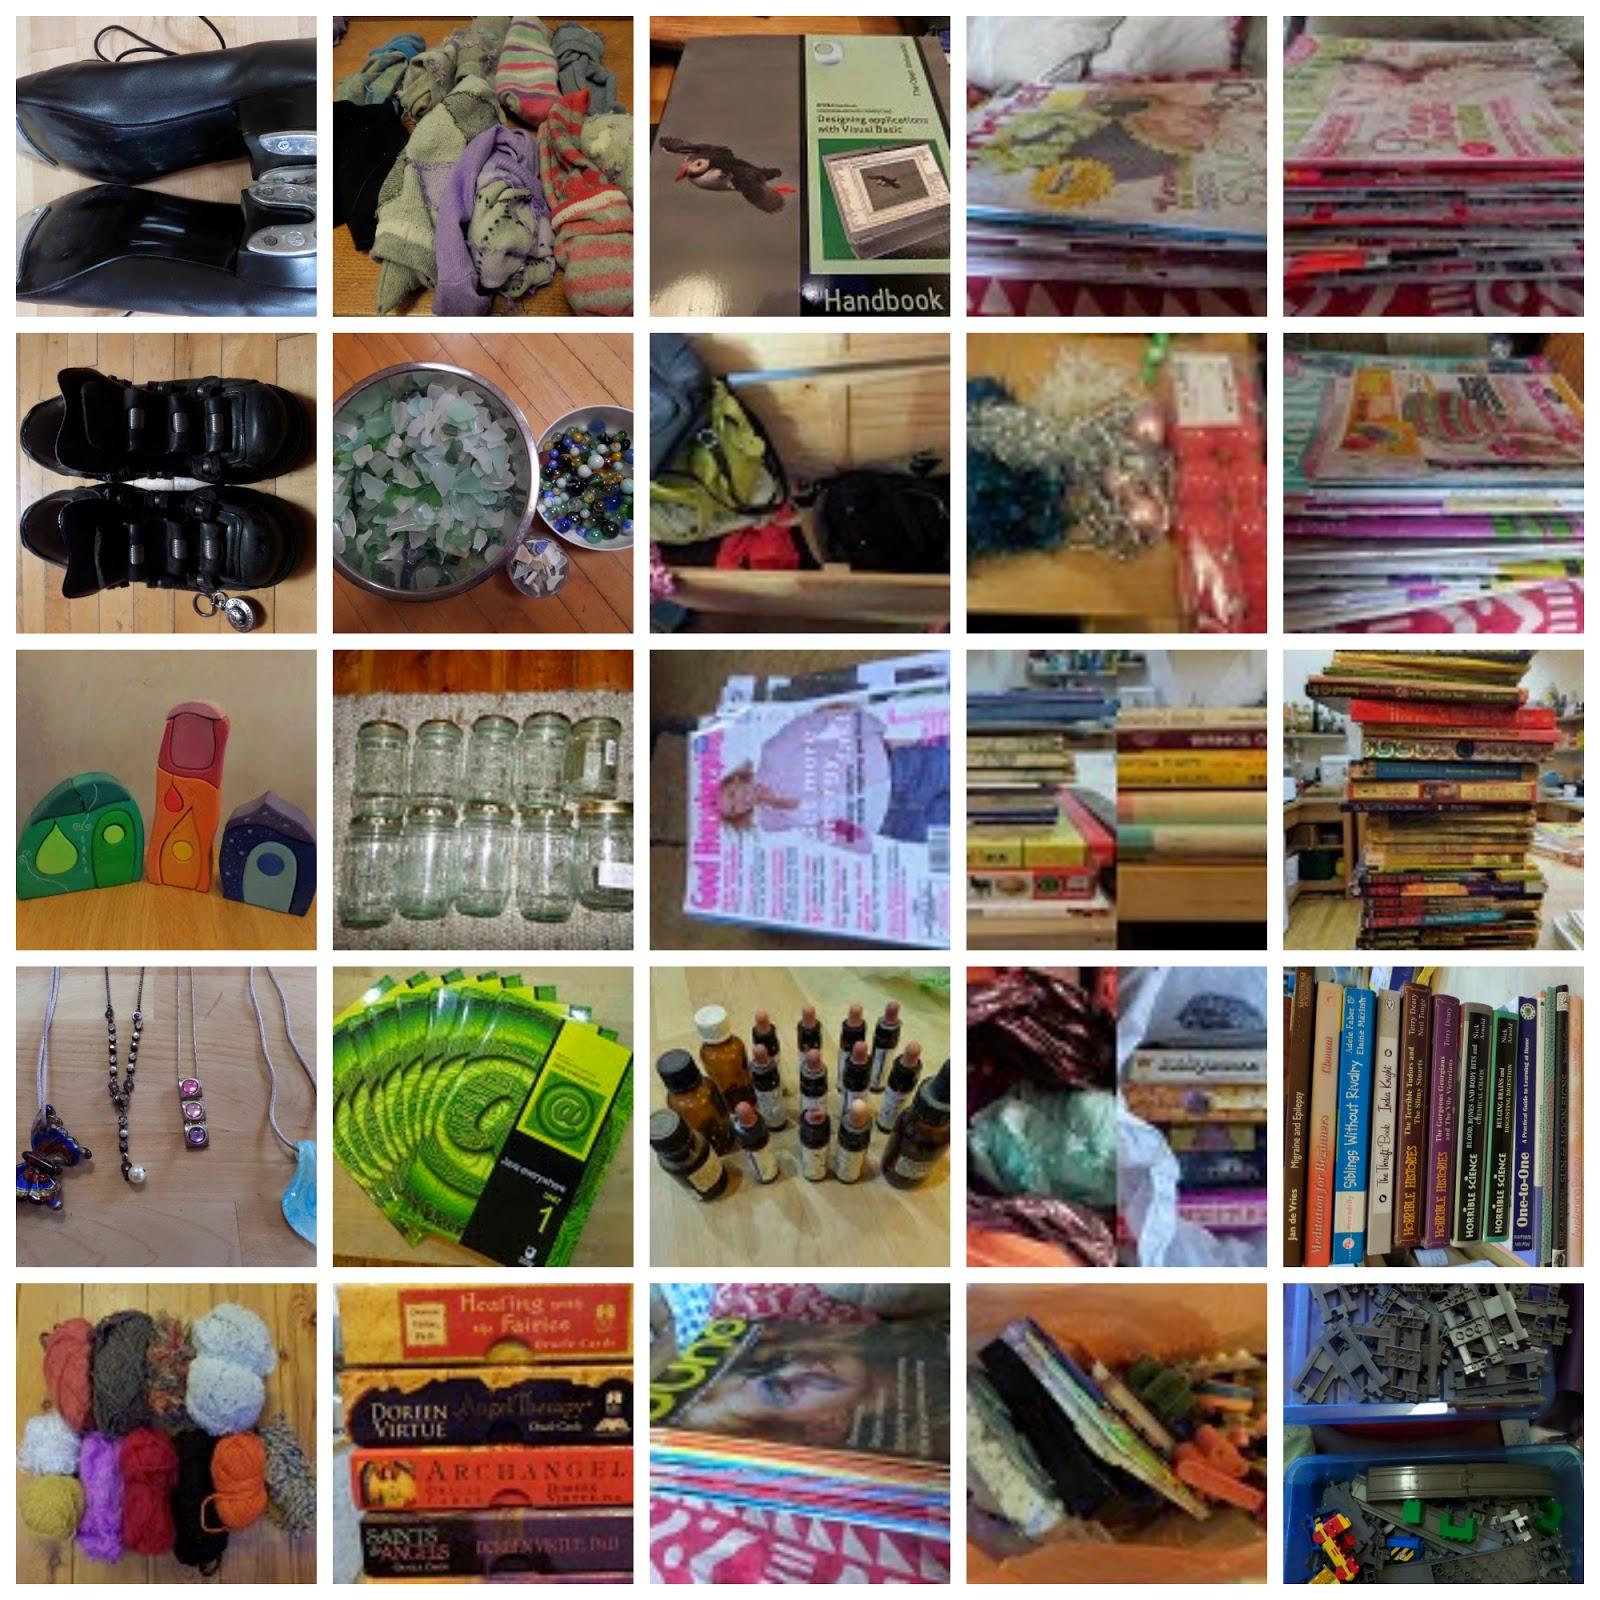 Items got rid of during minimalist January